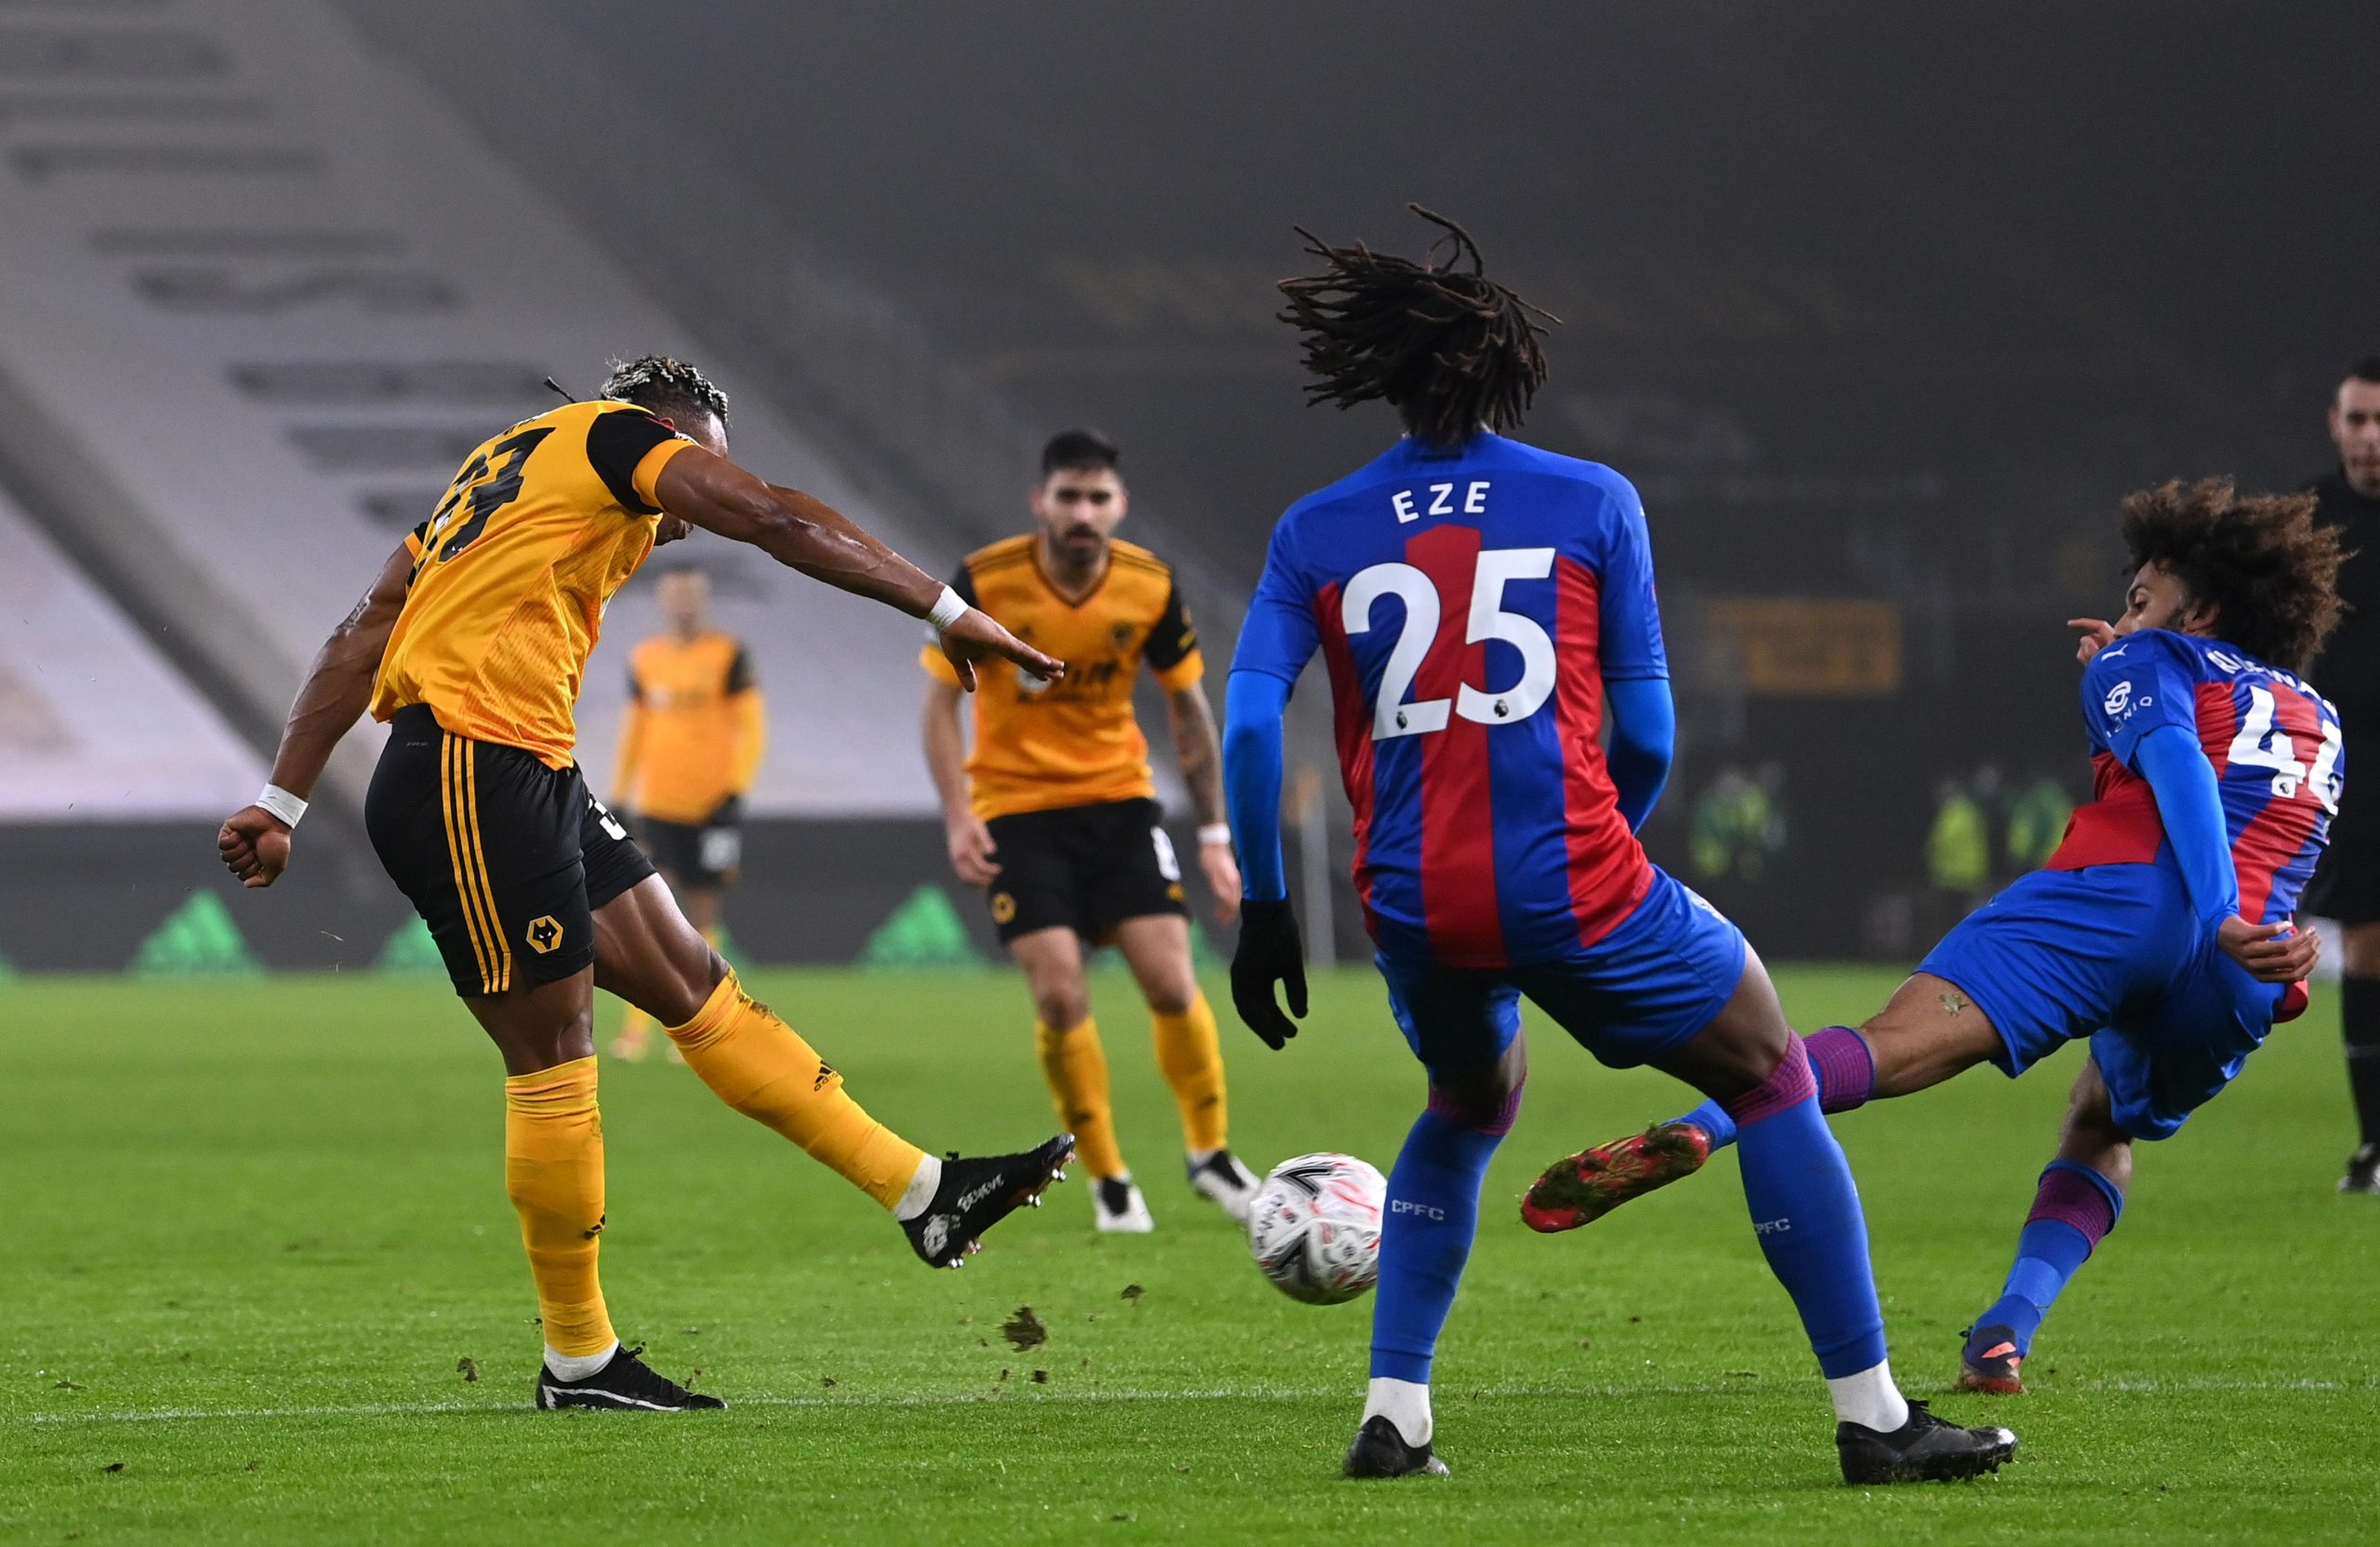 Wolverhampton Wanderers Bleacher Report Latest News Scores Stats And Standings